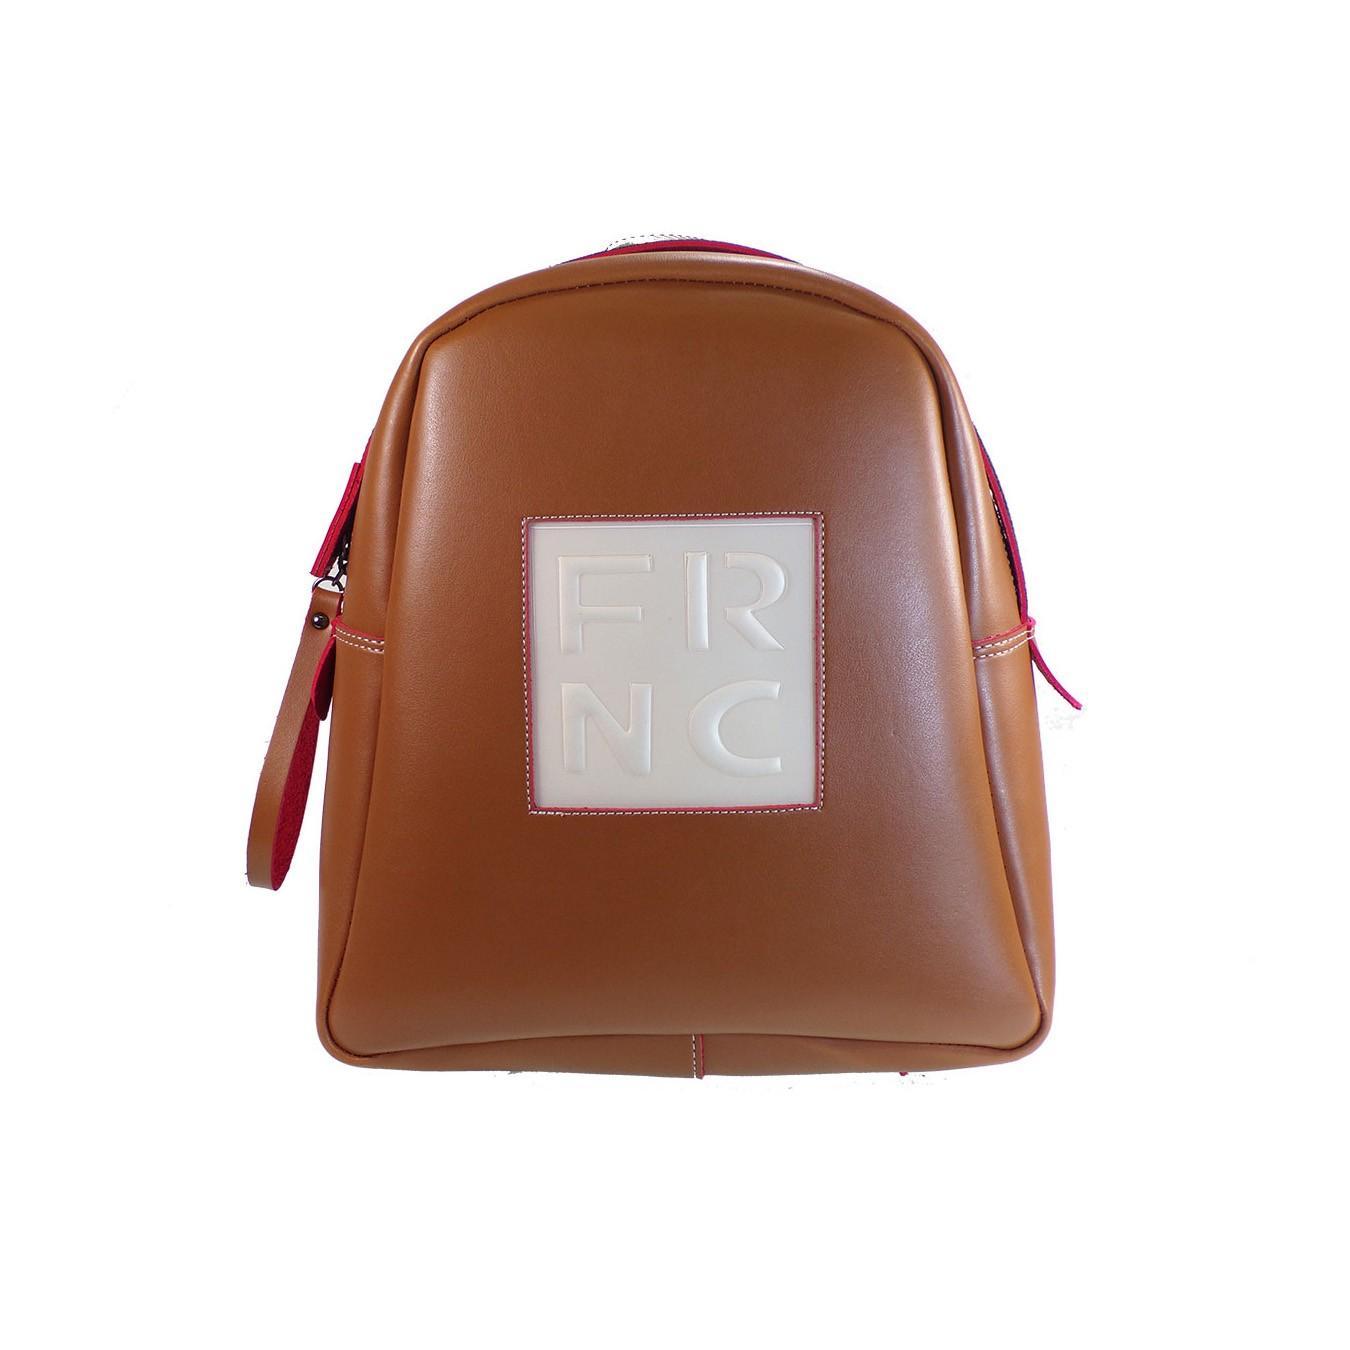 222f0e3e6a FRNC FRANCESCO Τσάντα Γυναικεία Πλάτης-Backpack 1201 Ταμπά Δέρμα ...